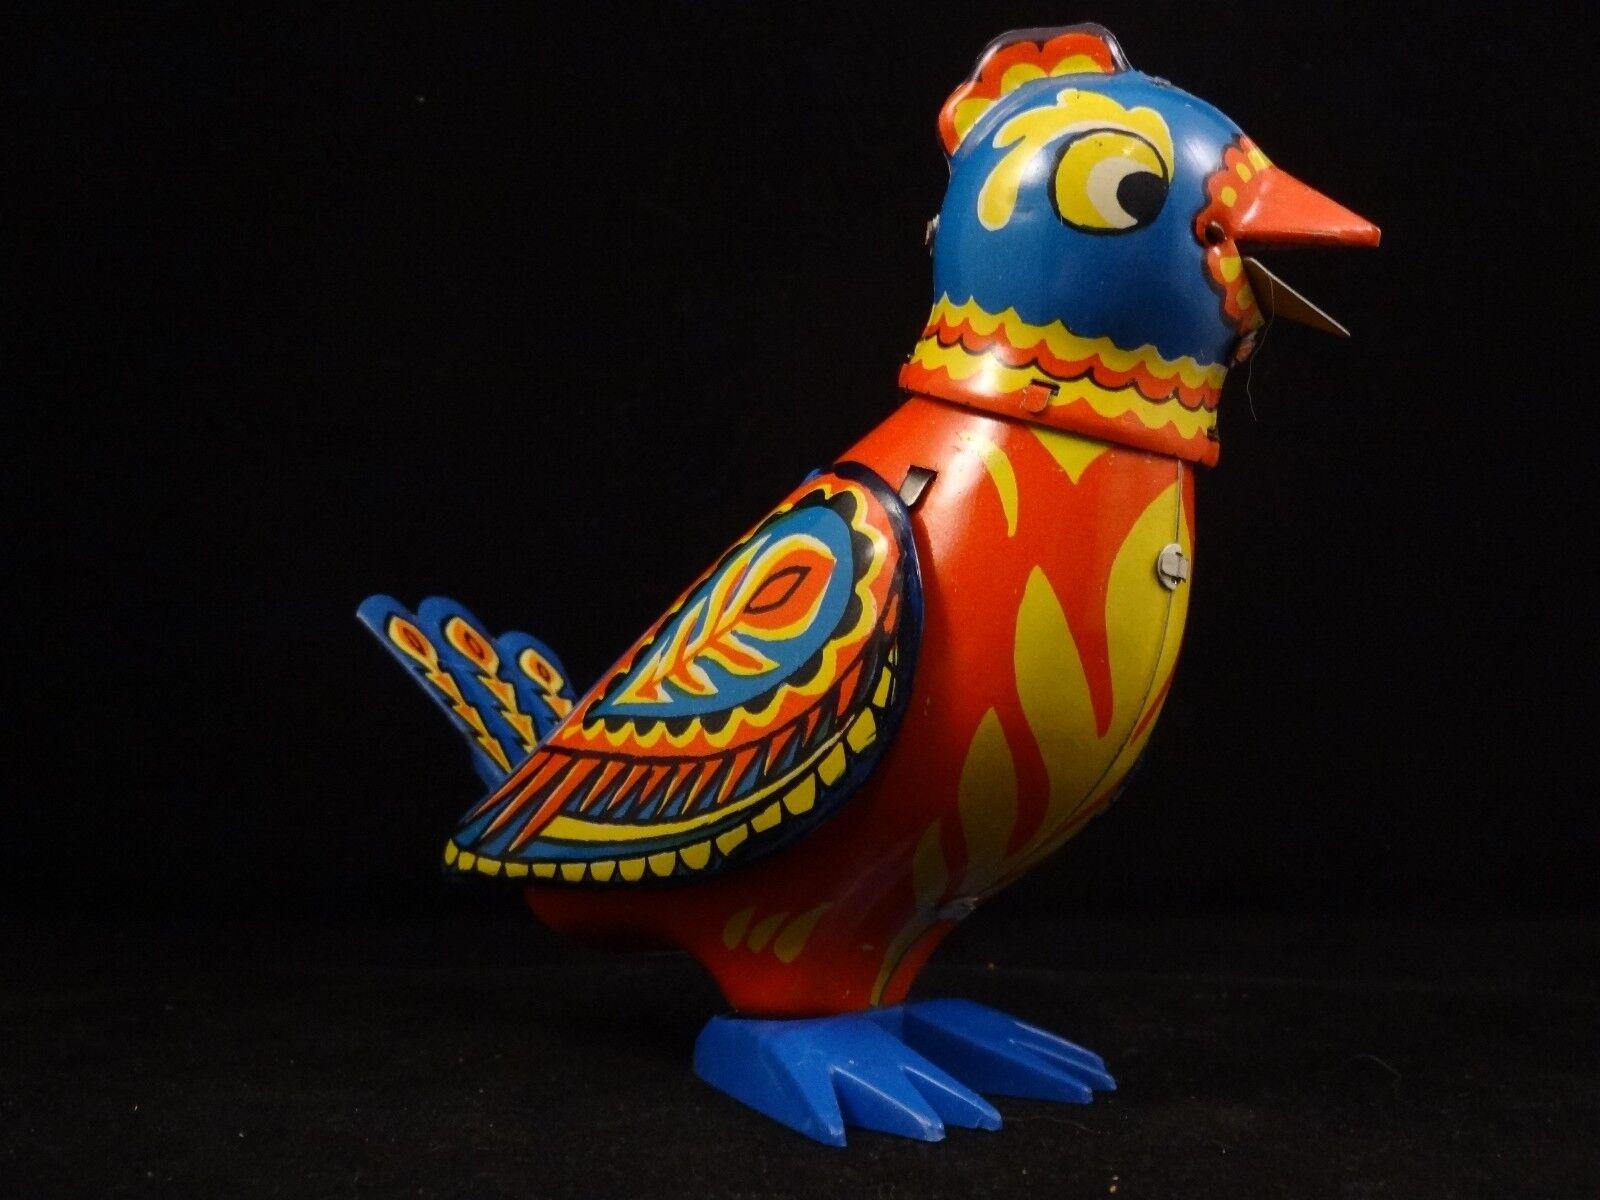 Ancien jouet oiseau tôle multicolore mécanique singing singing singing bird Russia St Petersburg ea4cf7